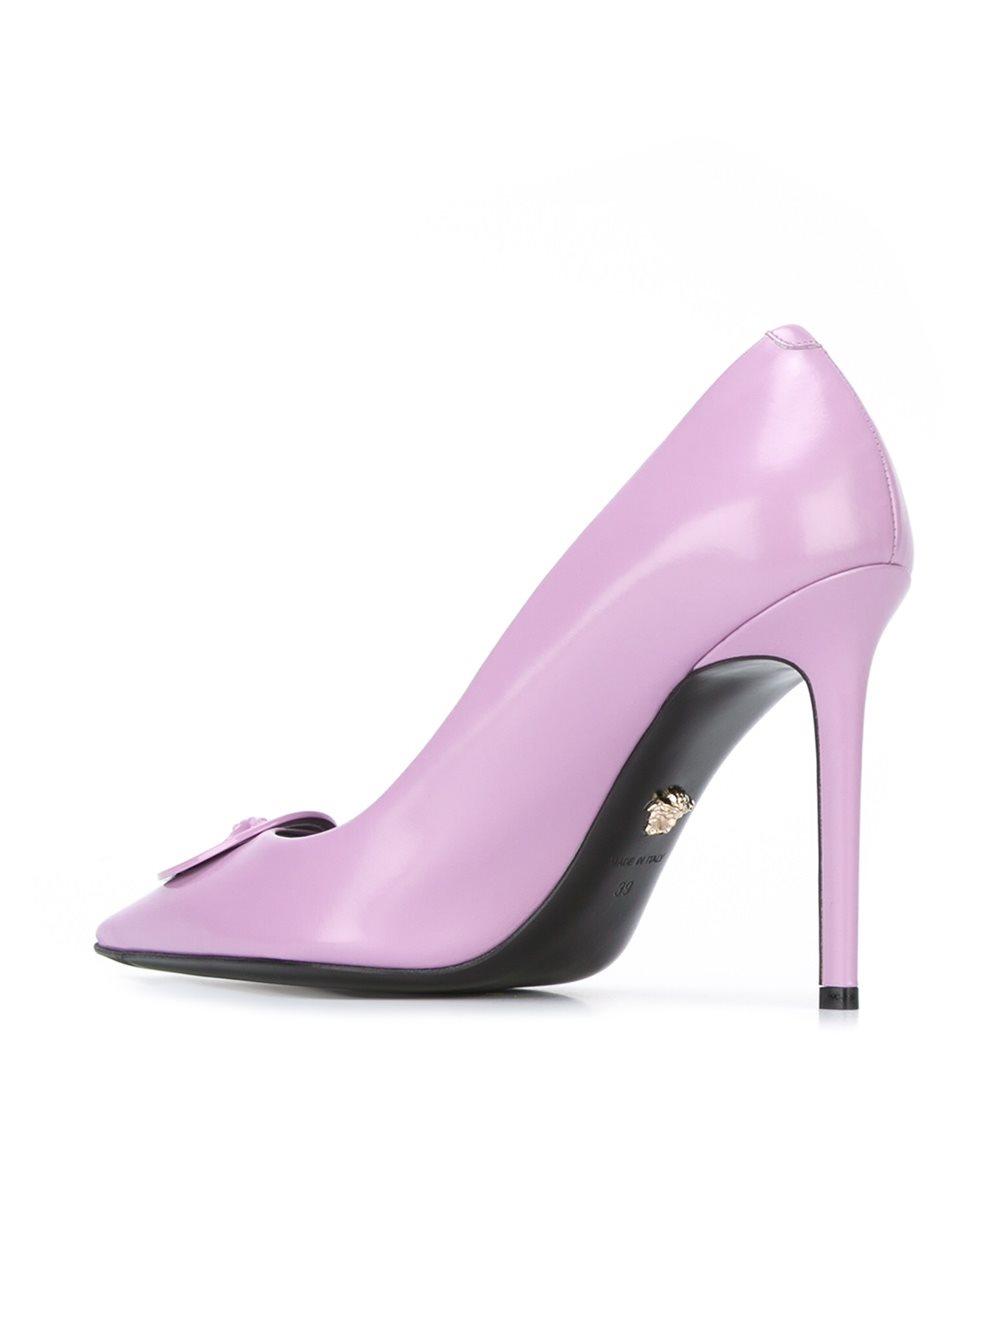 Medusa pumps - Pink & Purple Versace Fc4LZ7j7